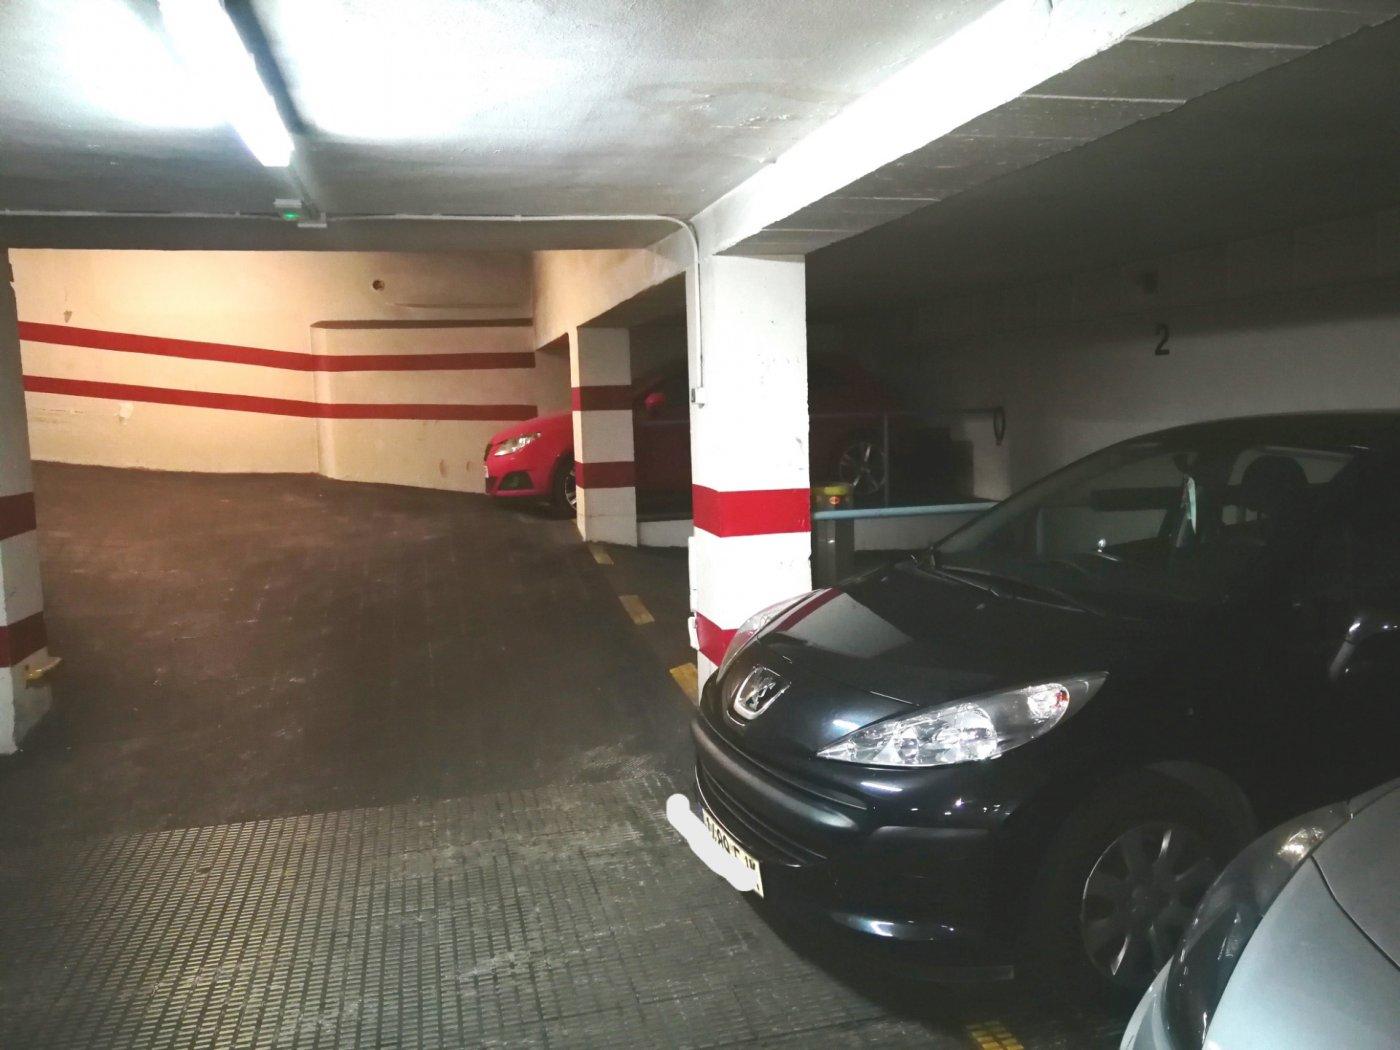 Vendo plaza garaje calle fita - imagenInmueble3